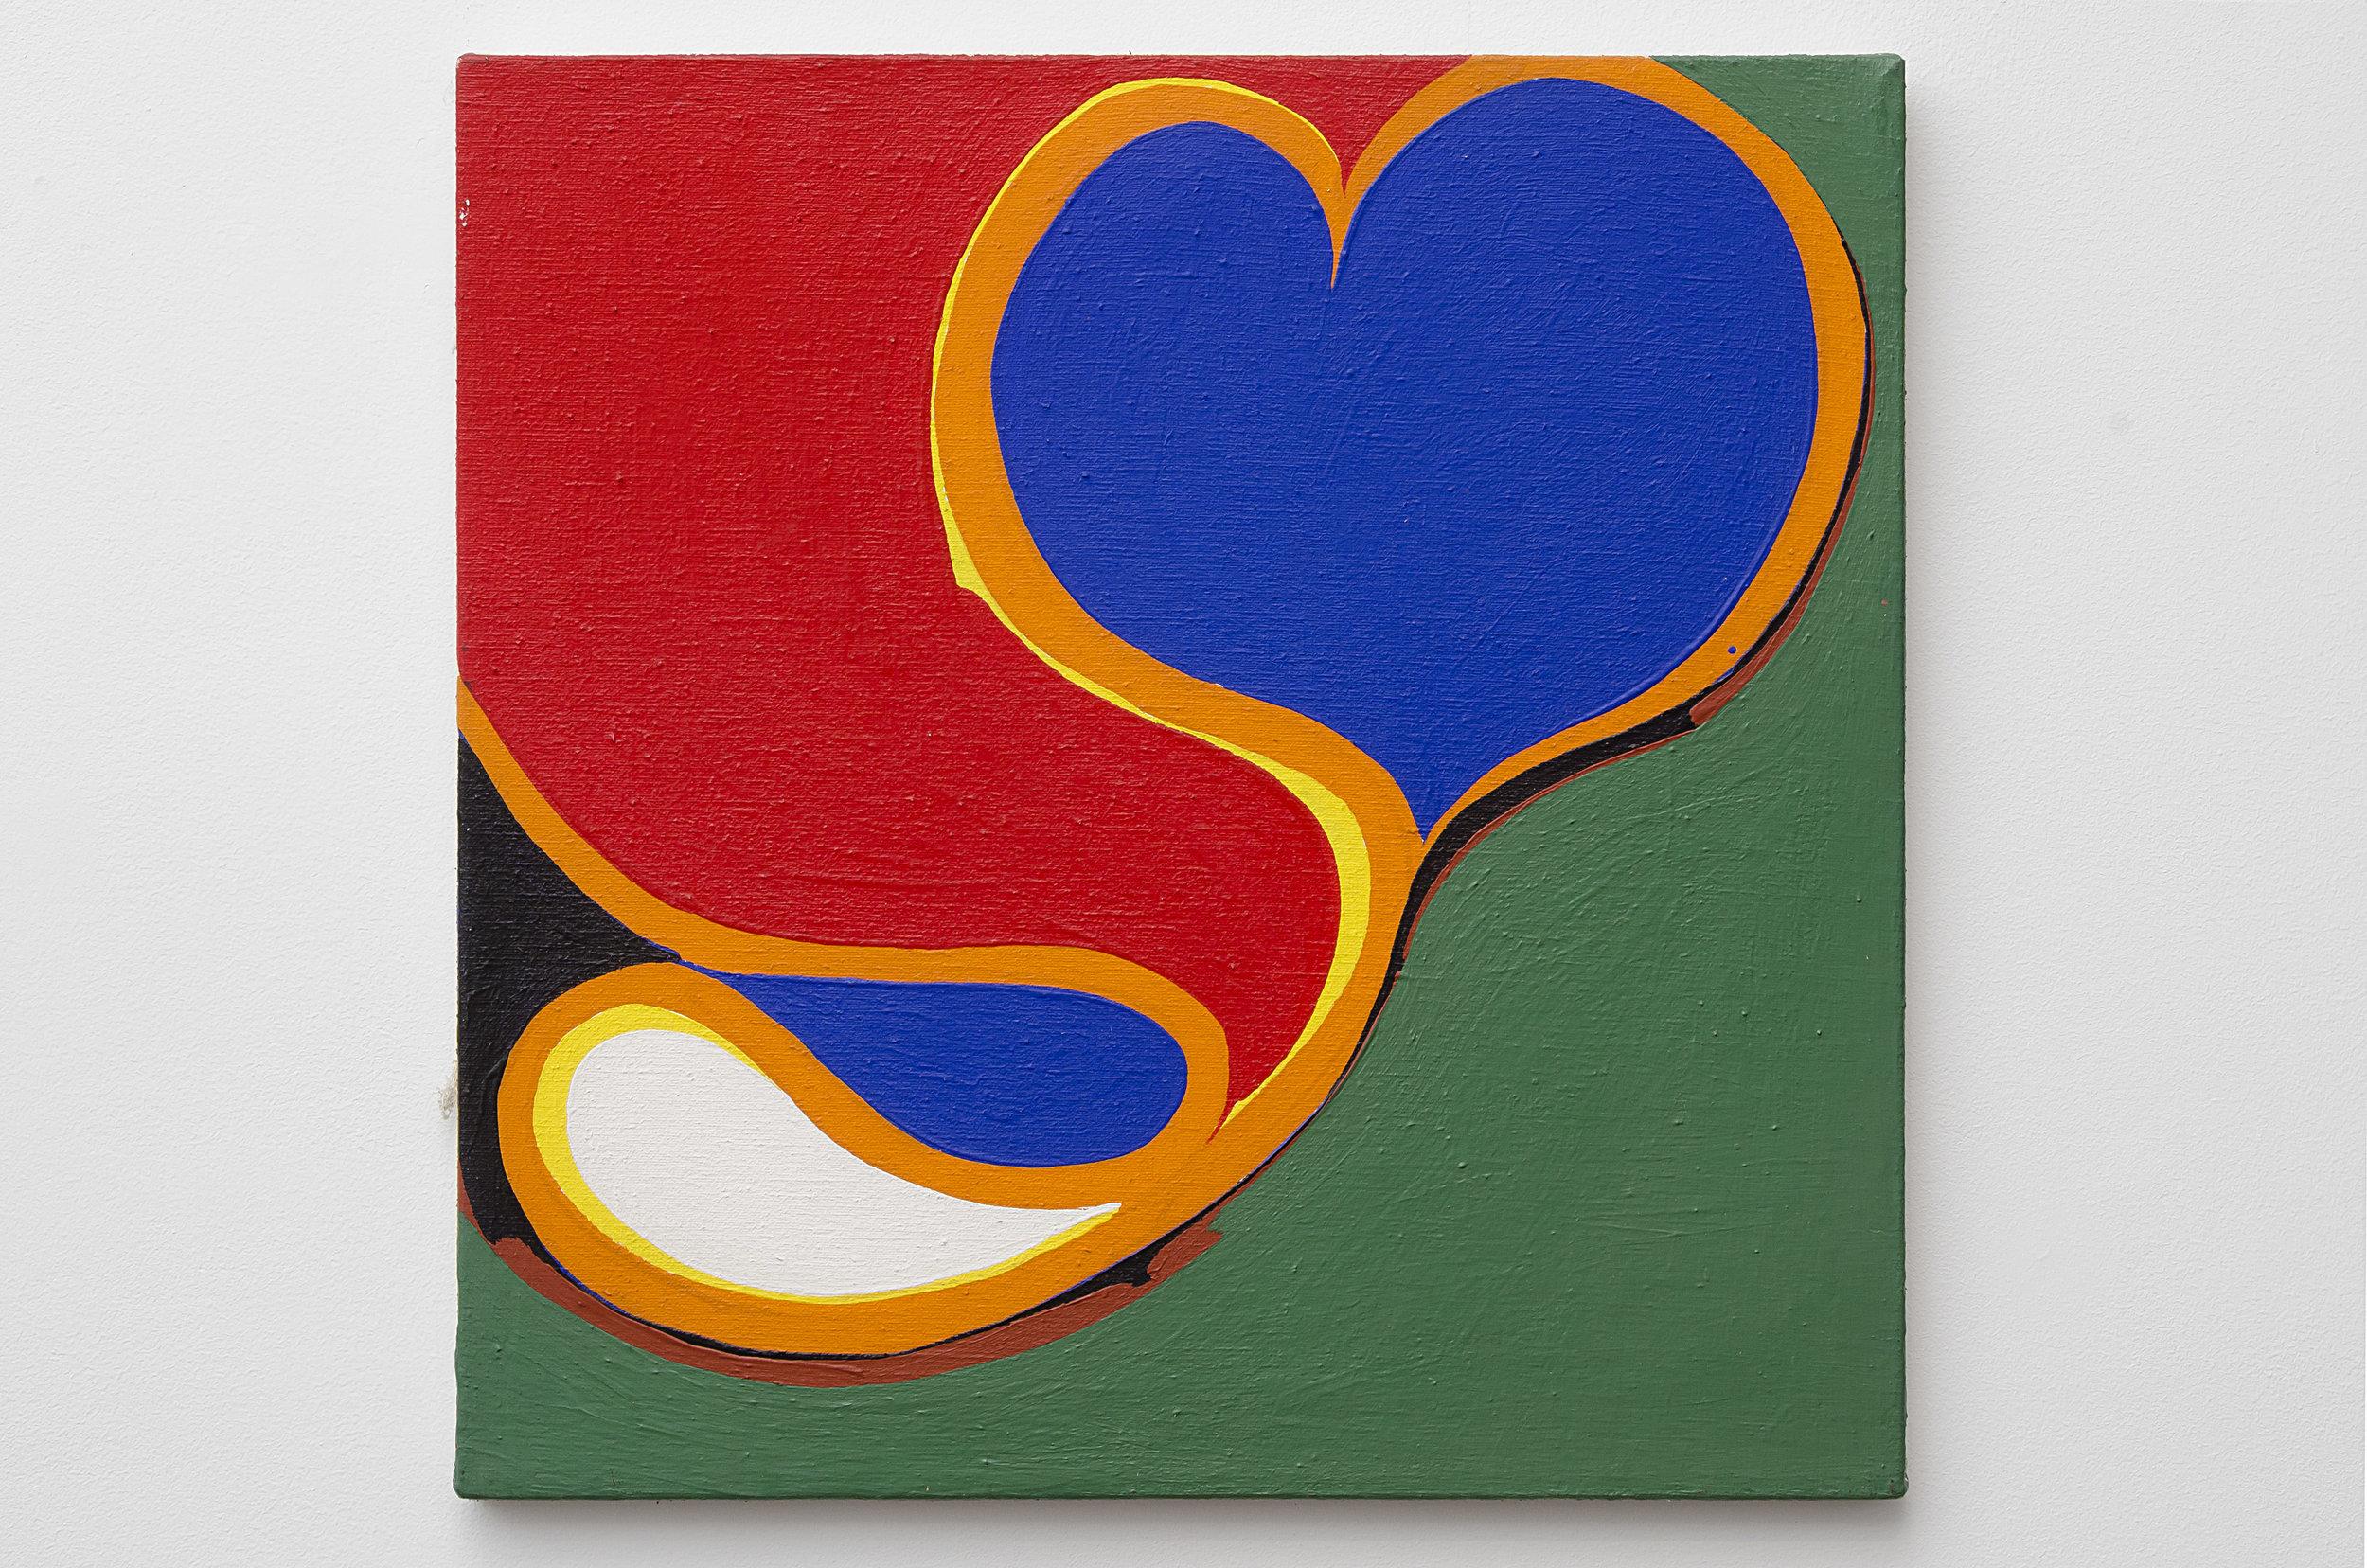 Hidalgo #11 , 1965 acrylic on canvas 20 x 20 inches; 50.8 x 50.8 centimeters